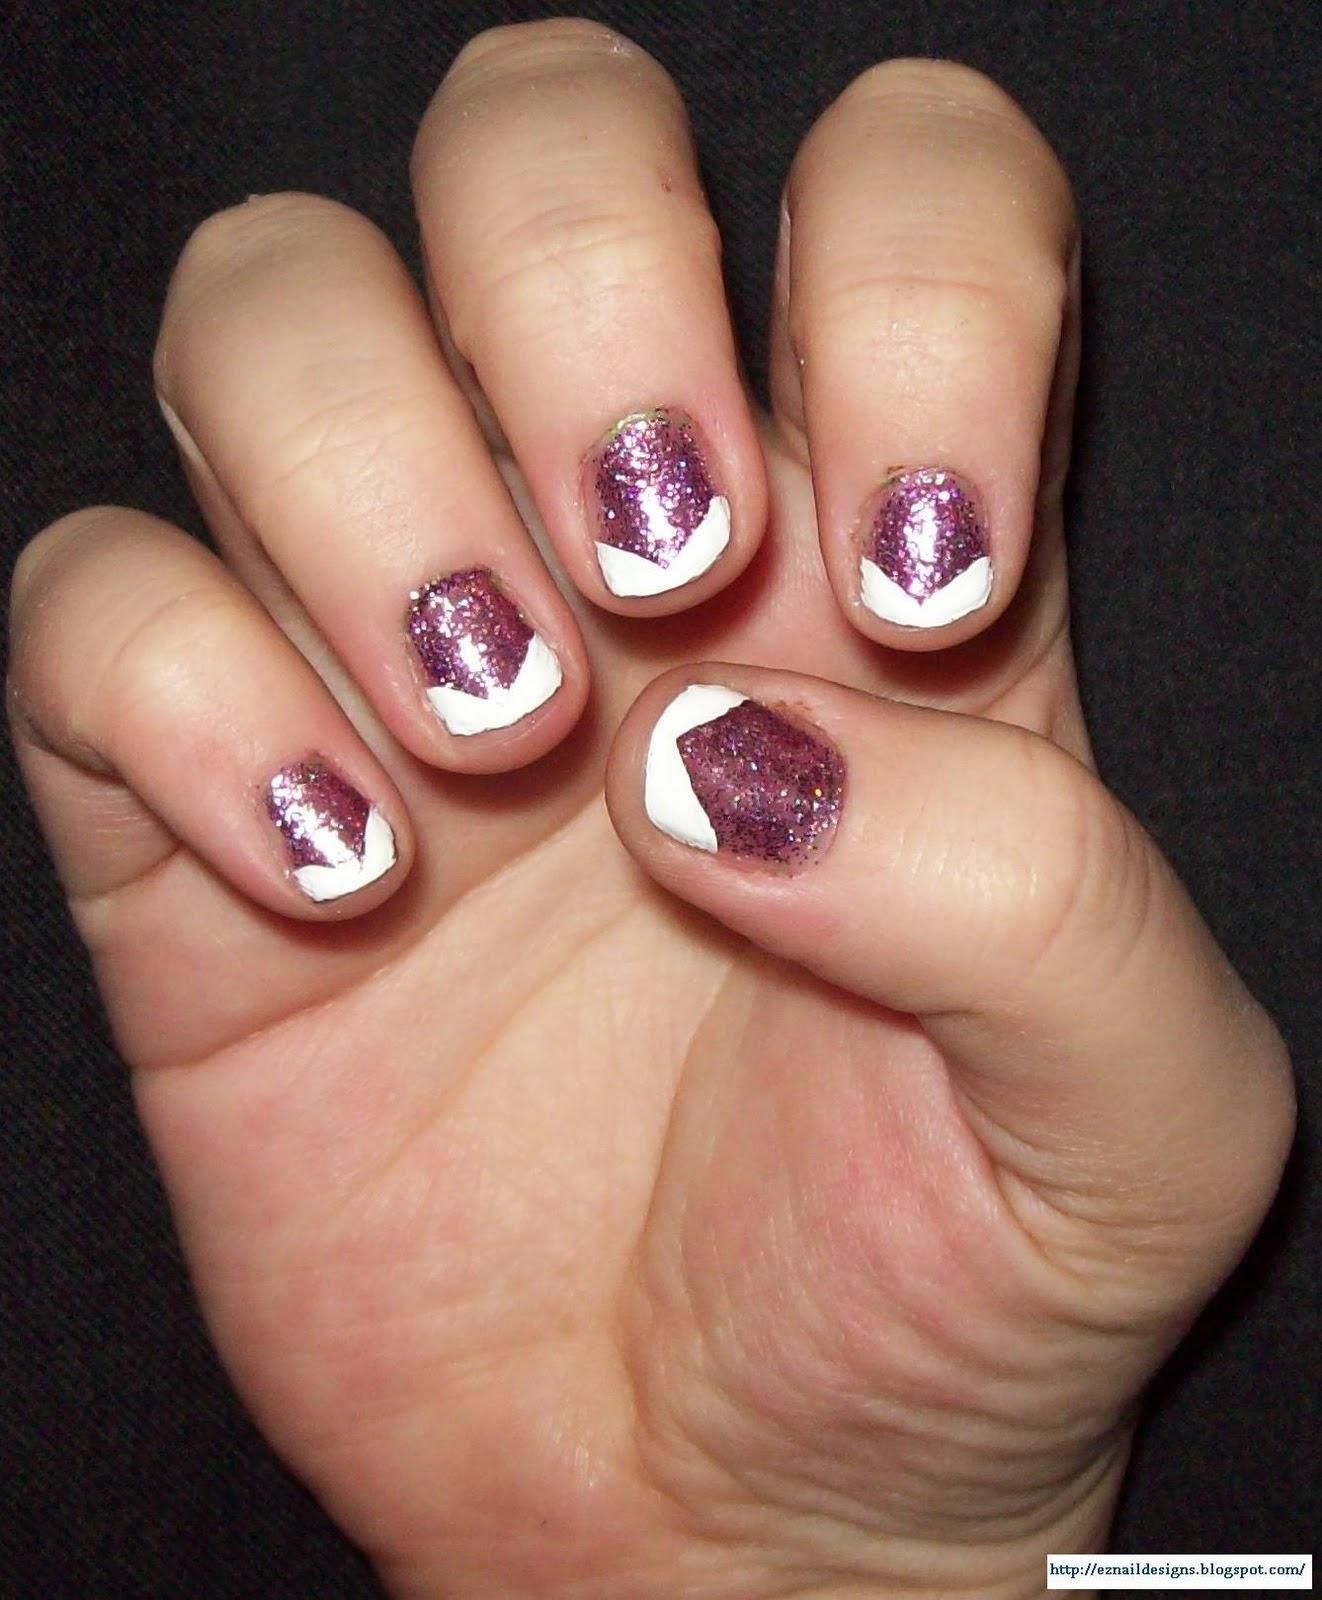 Acrylic White Tip Nail Designs - Nail Art Design Ideas Collection